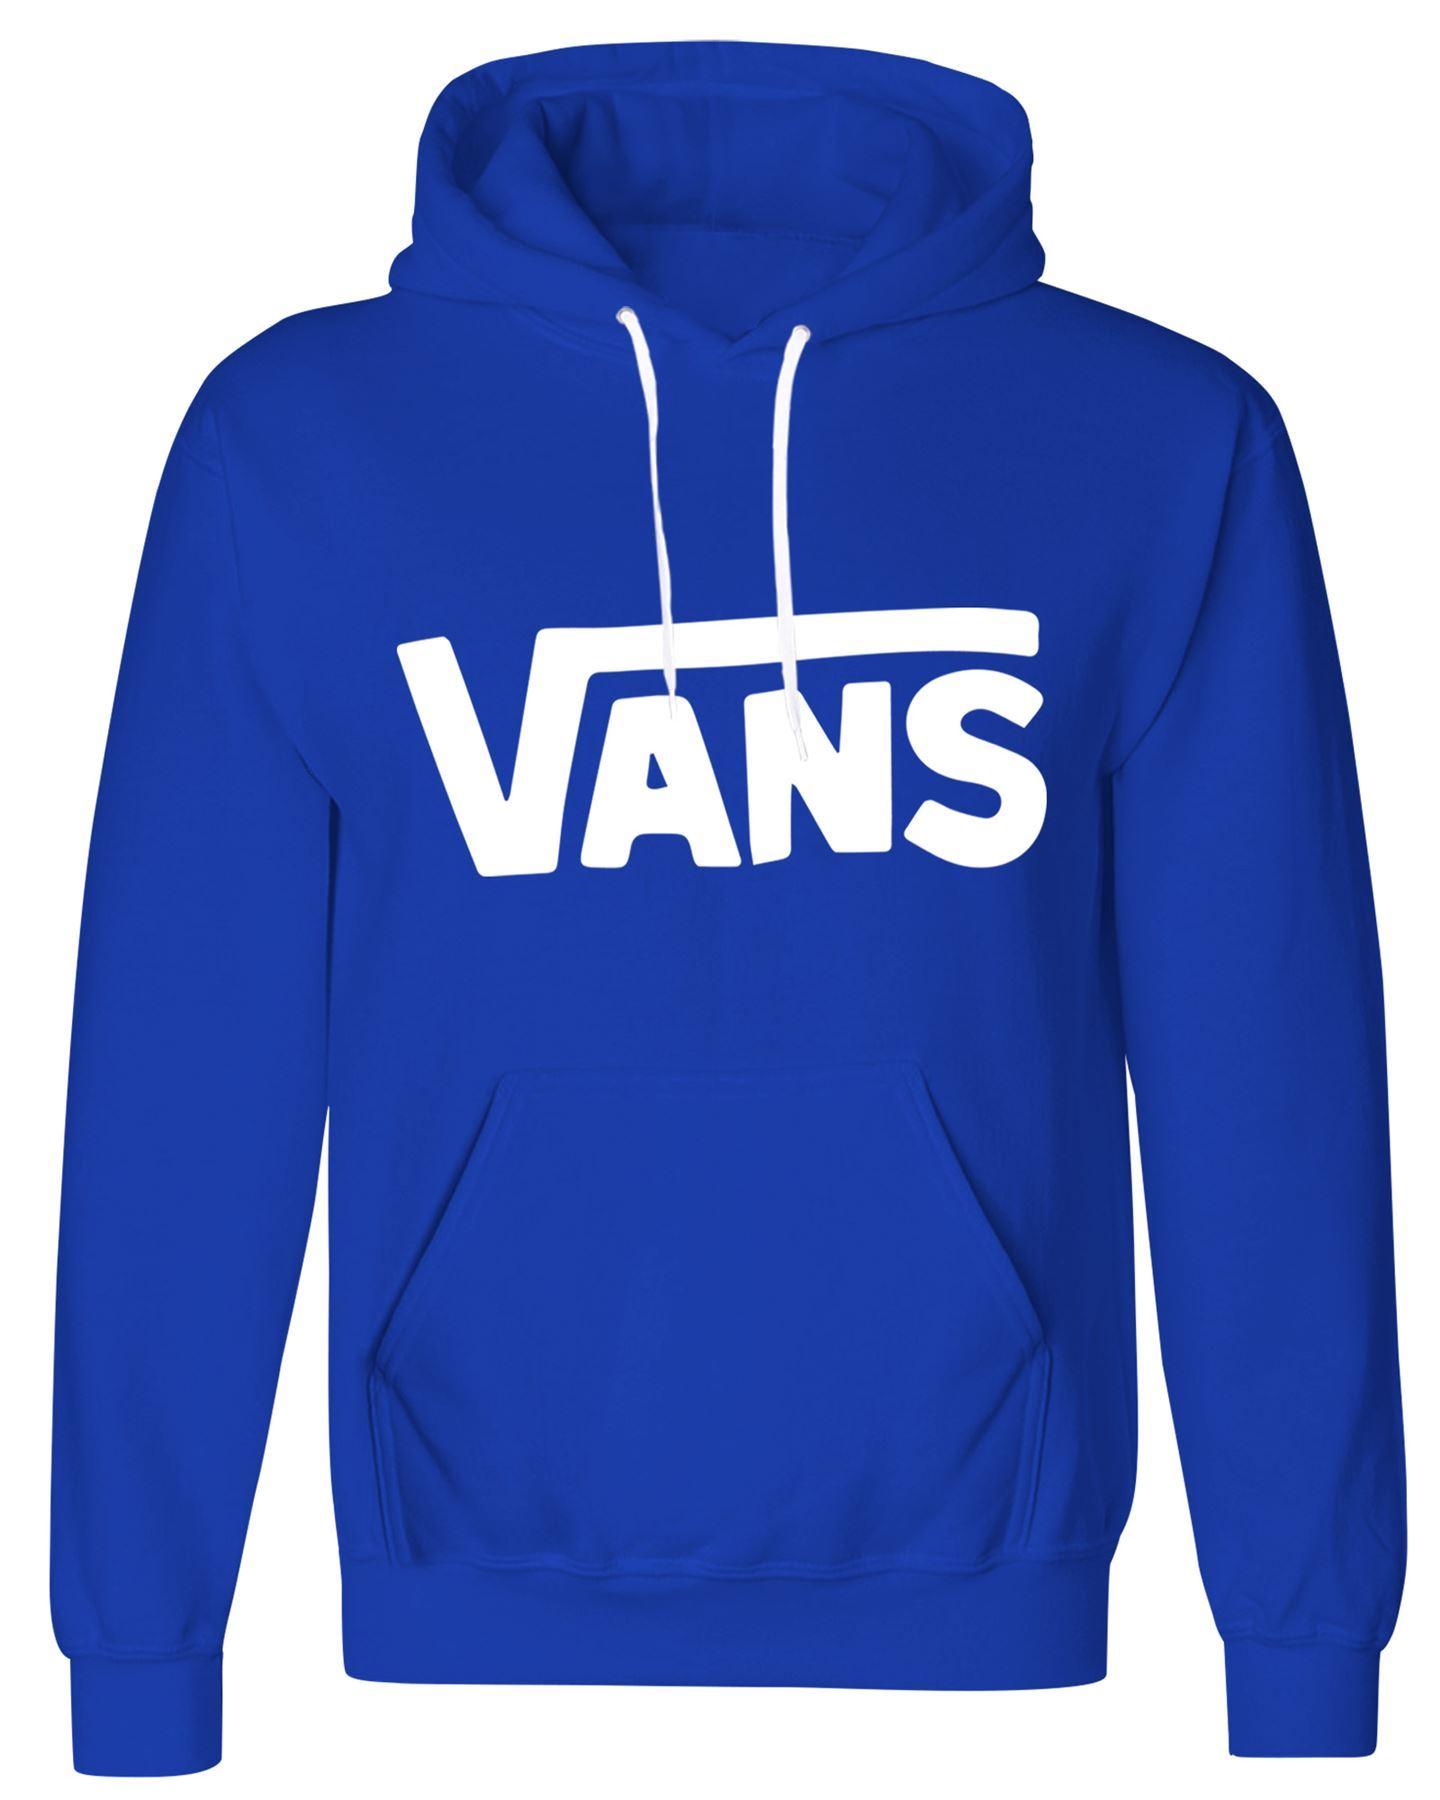 Classic Vans Logo Printed Sweatshirt Mens Womens Vans ...